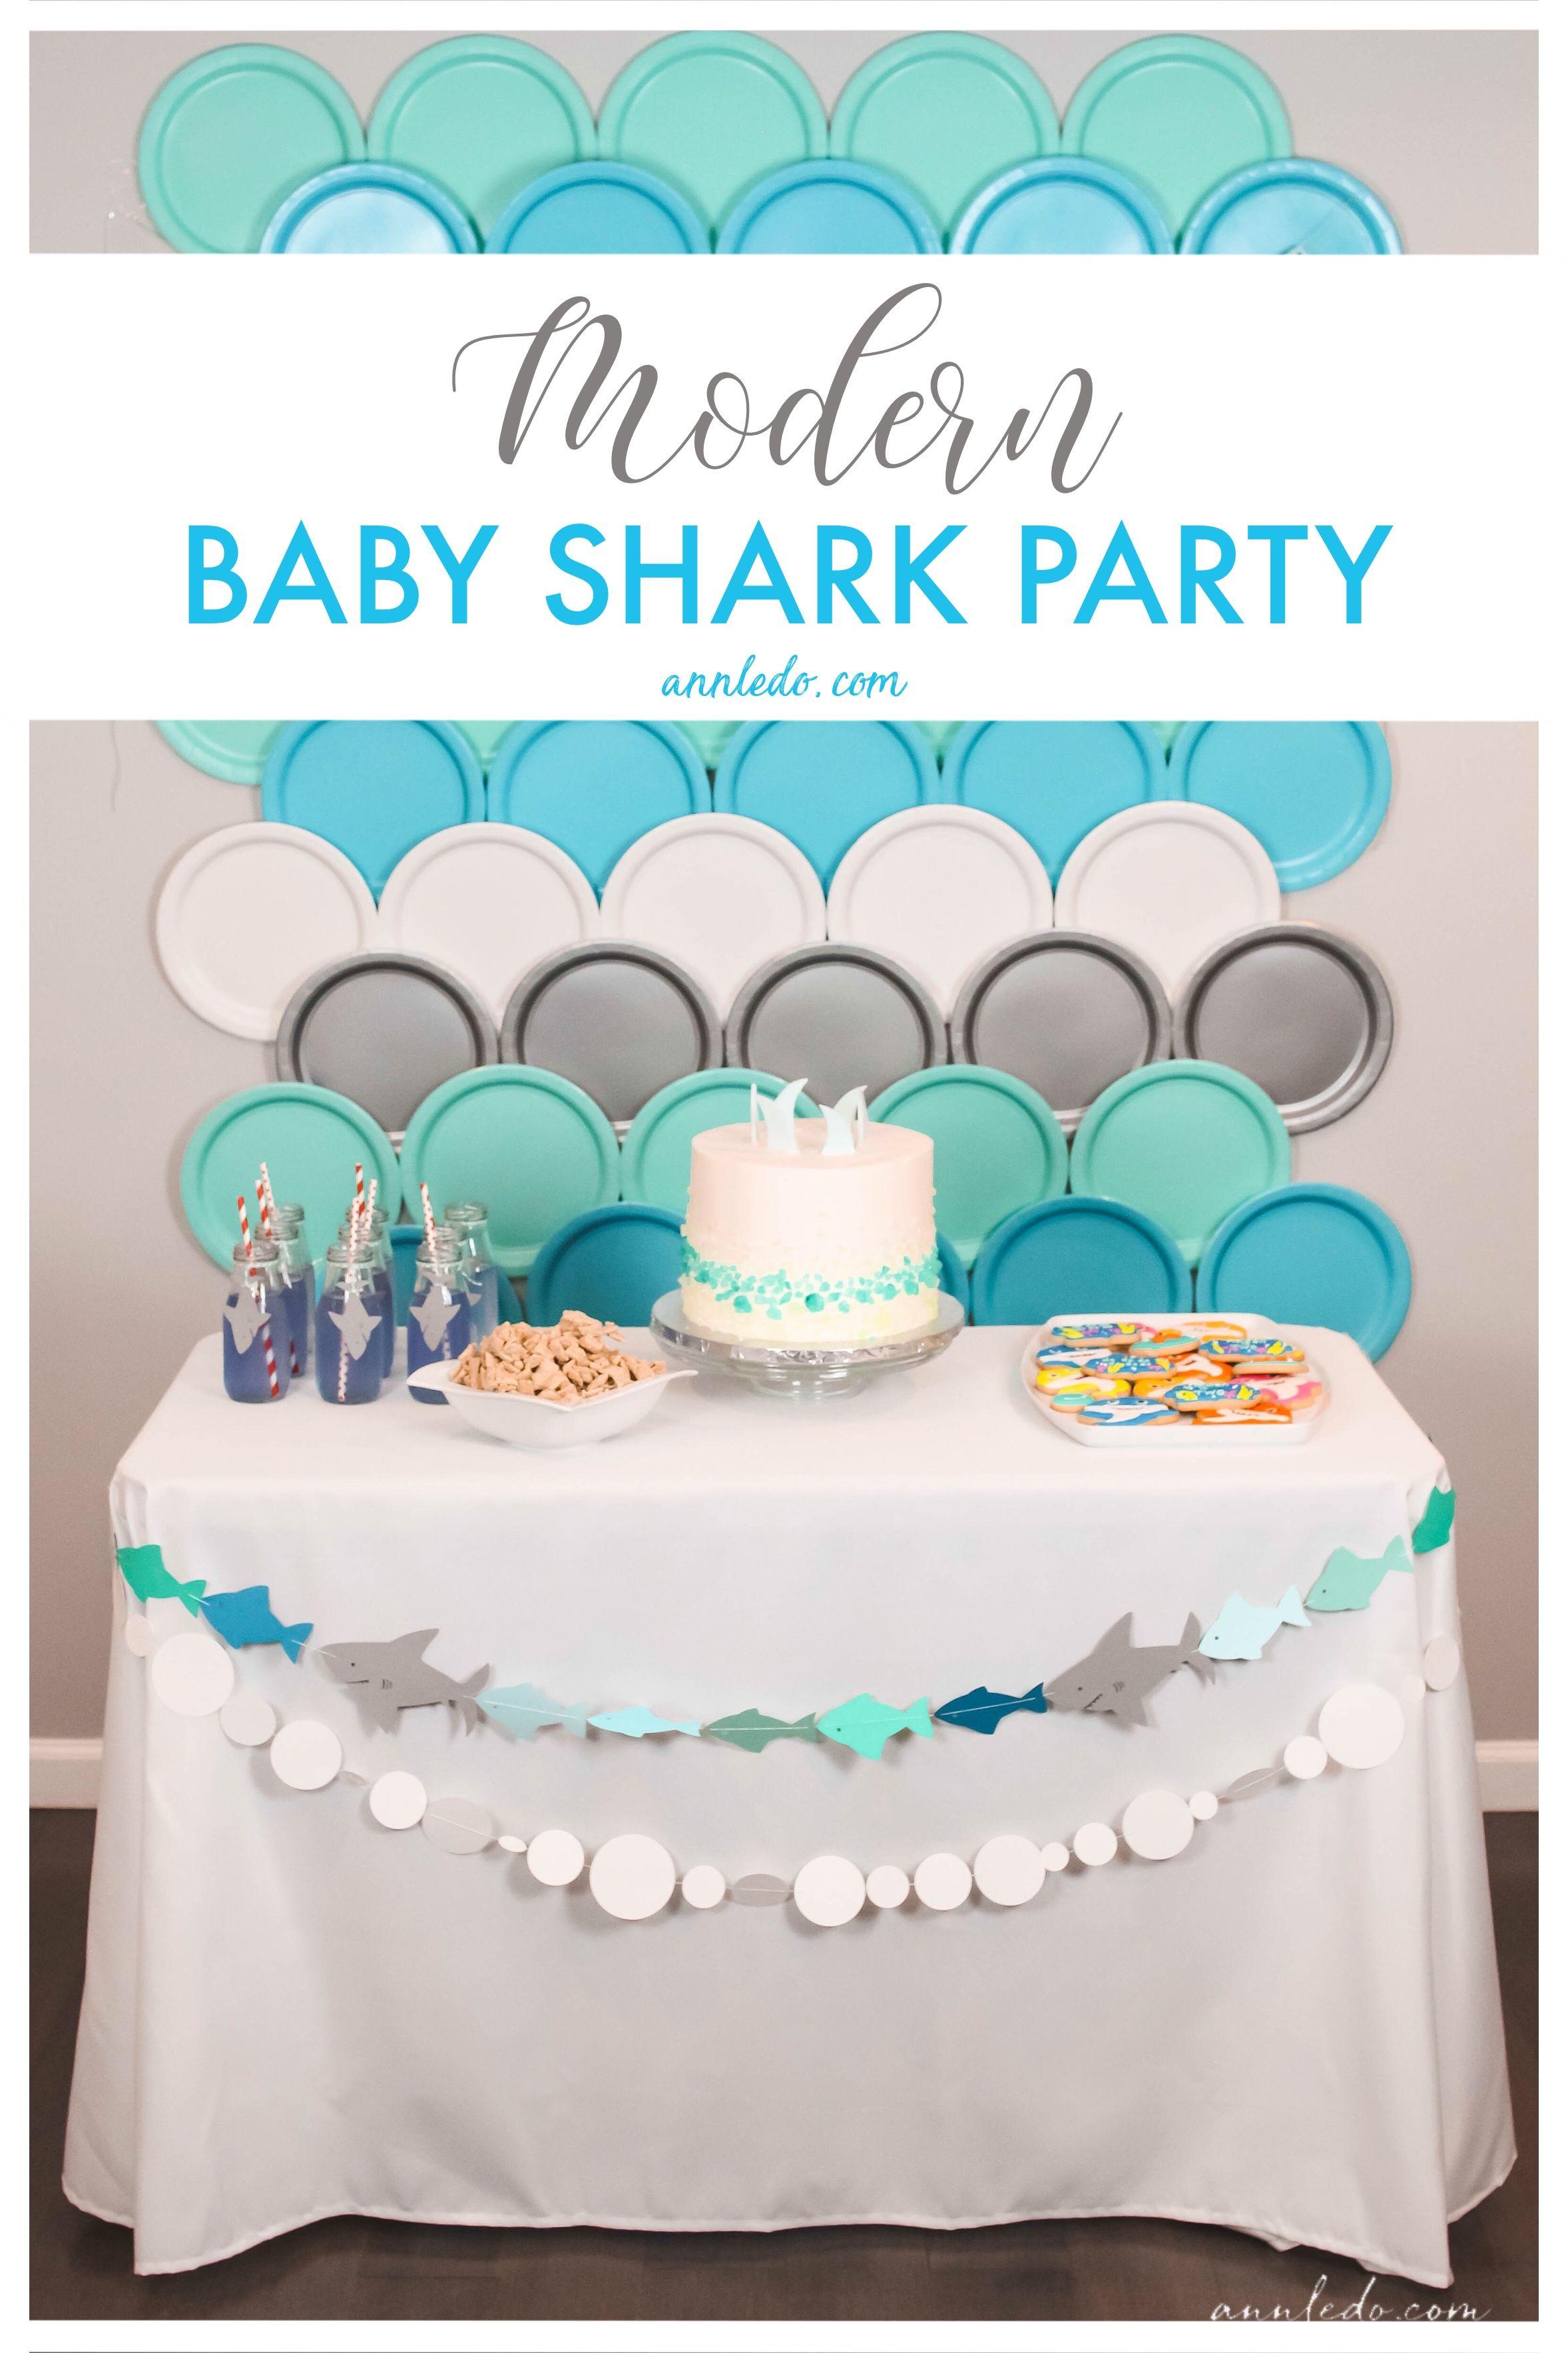 Shark Favors Shark Hat Surfing Party Shark Party Hat Boy Birthday Shark Birthday Party Supplies Shark Party Decor Shark Party Favors